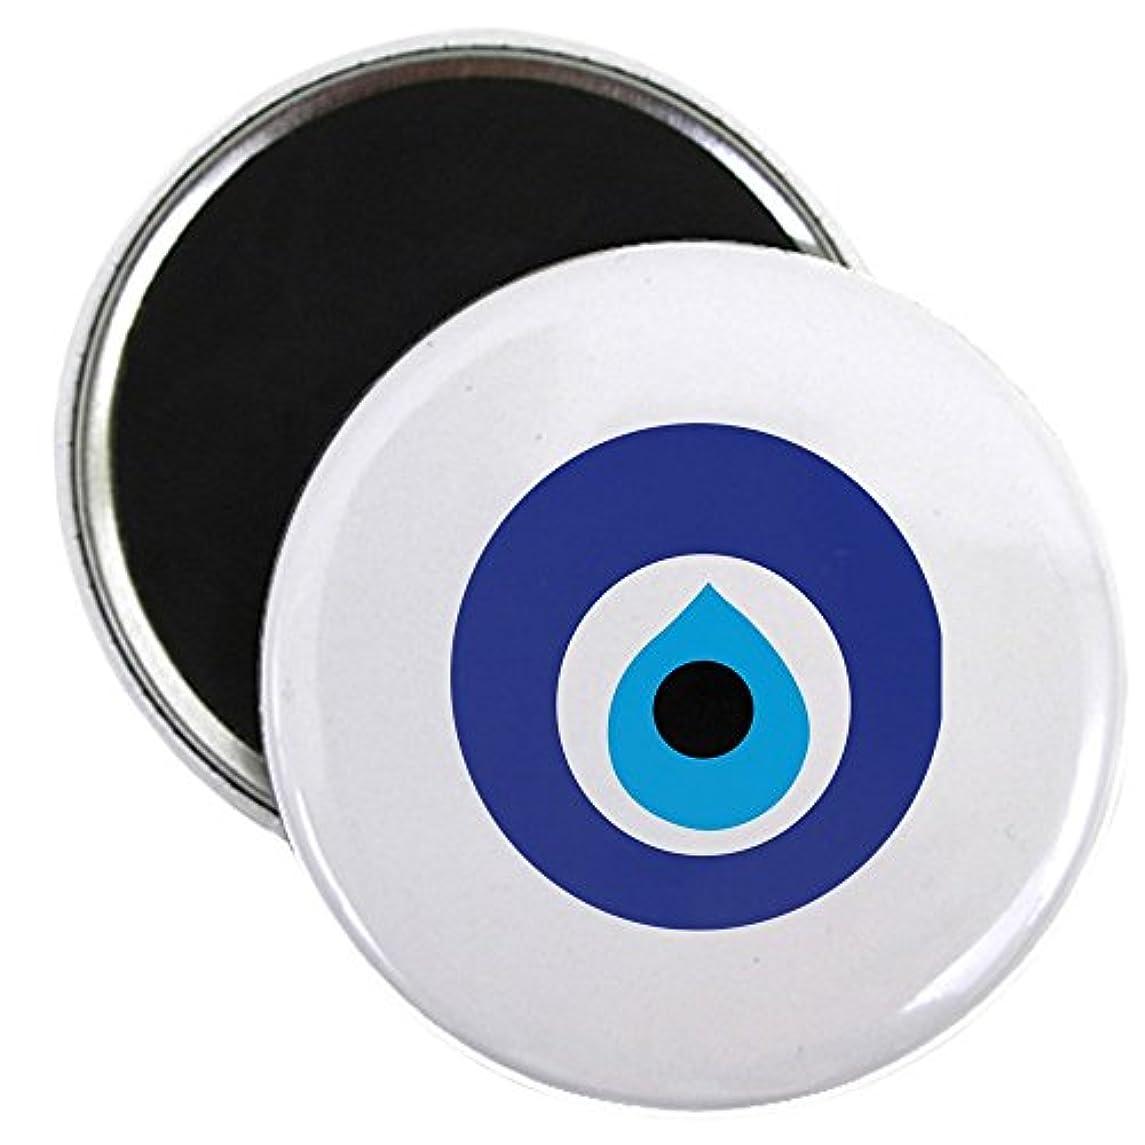 CafePress - Turkish Eye (Evil Eye) - 2.25